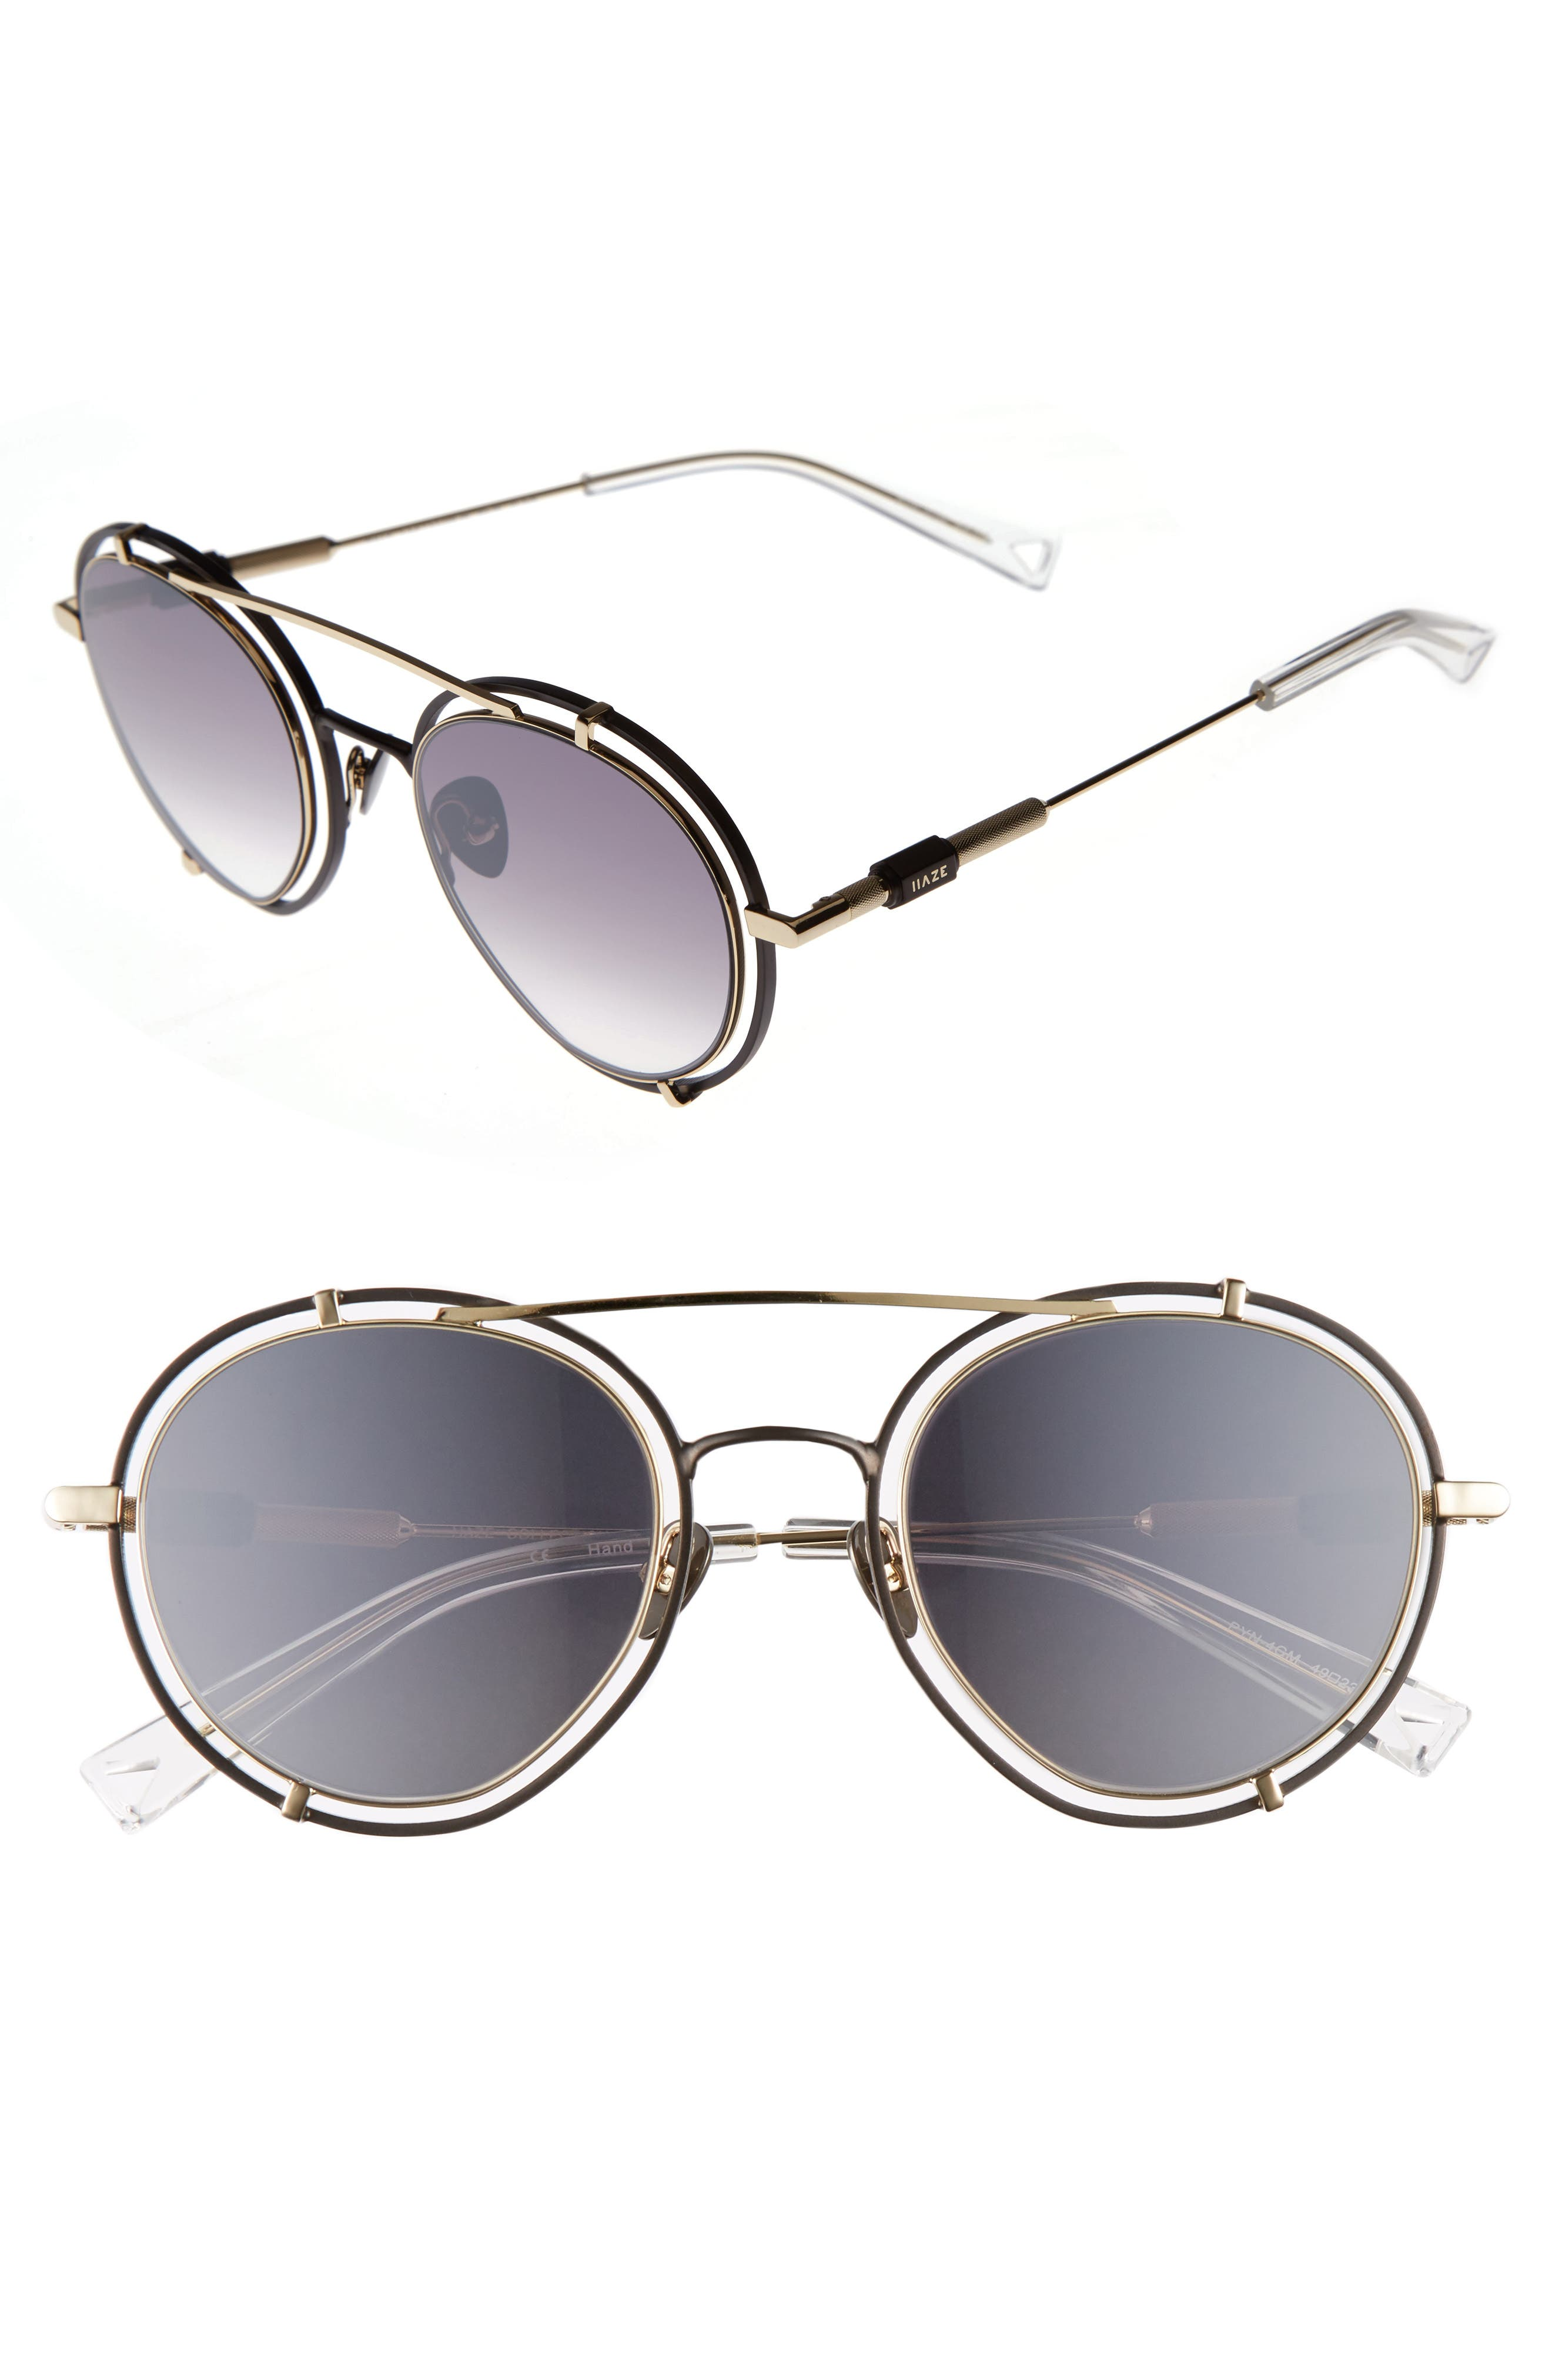 Main Image - HAZE Pyn 55mm Mirrored Sunglasses